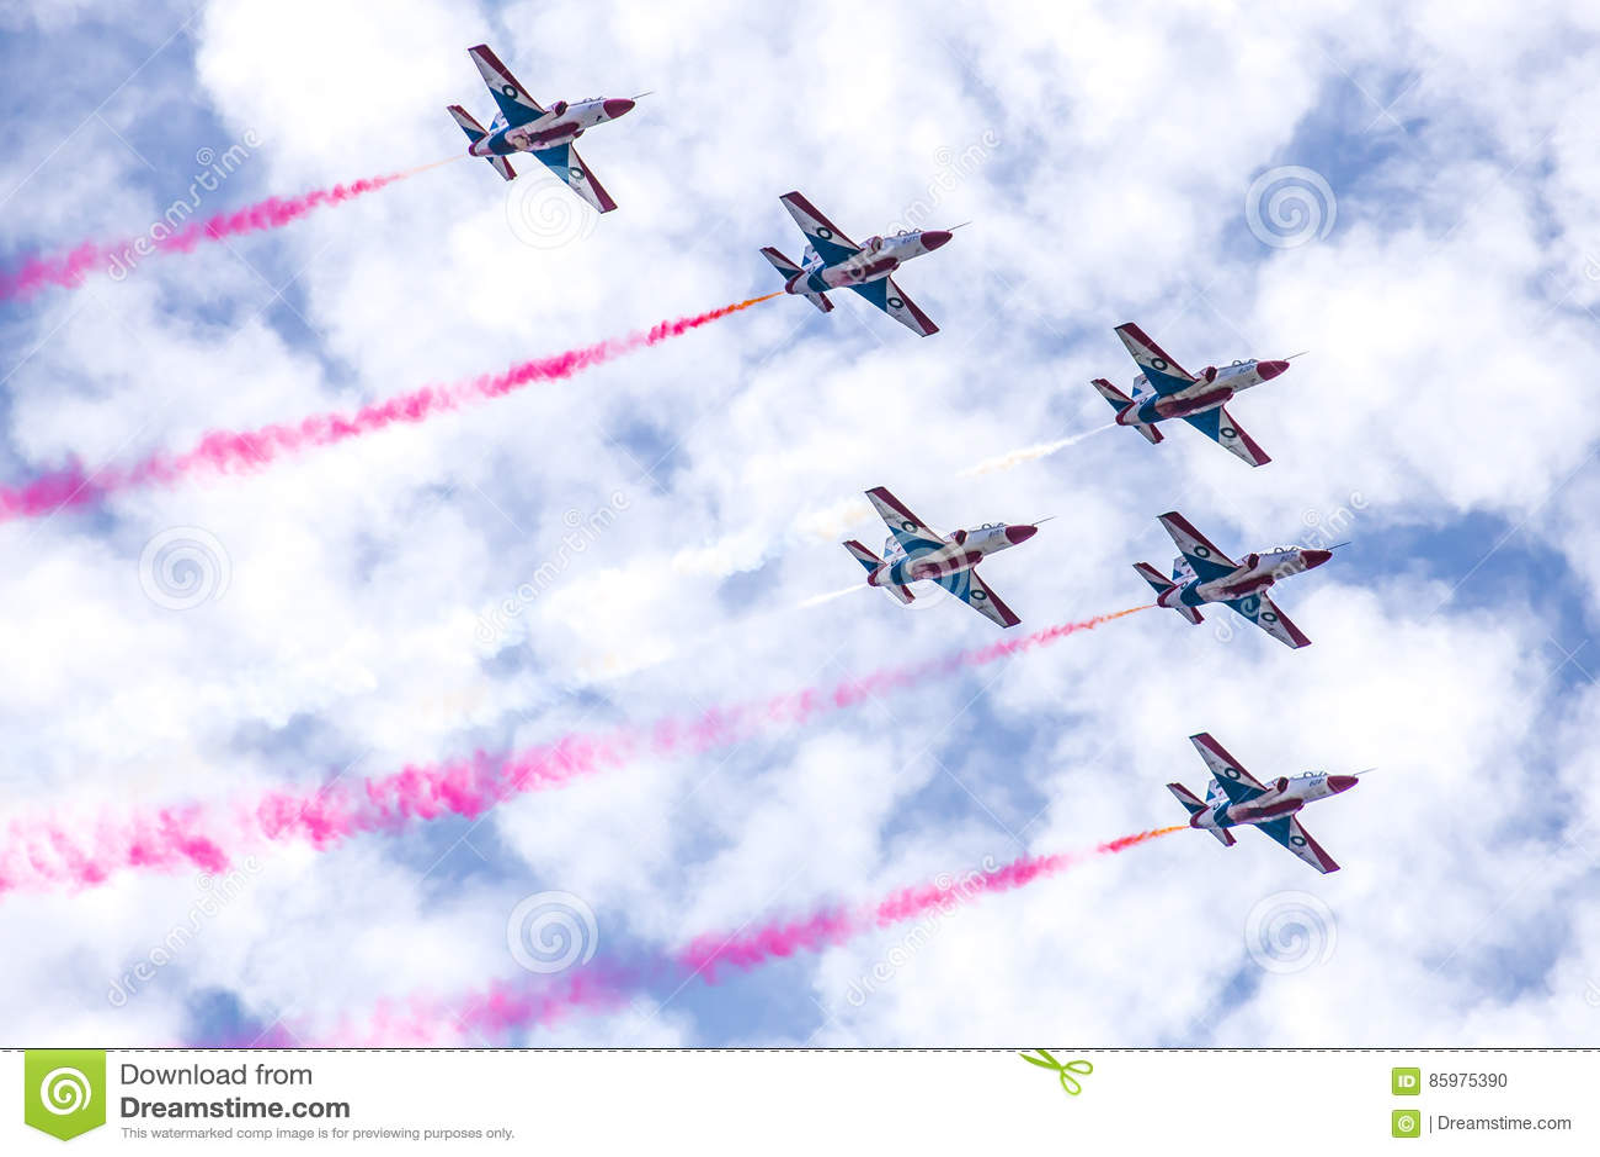 PAF K-8/Hongdu JL-8, le acrobazie aeree di Sherdils Team, Islamabad, Pakistan